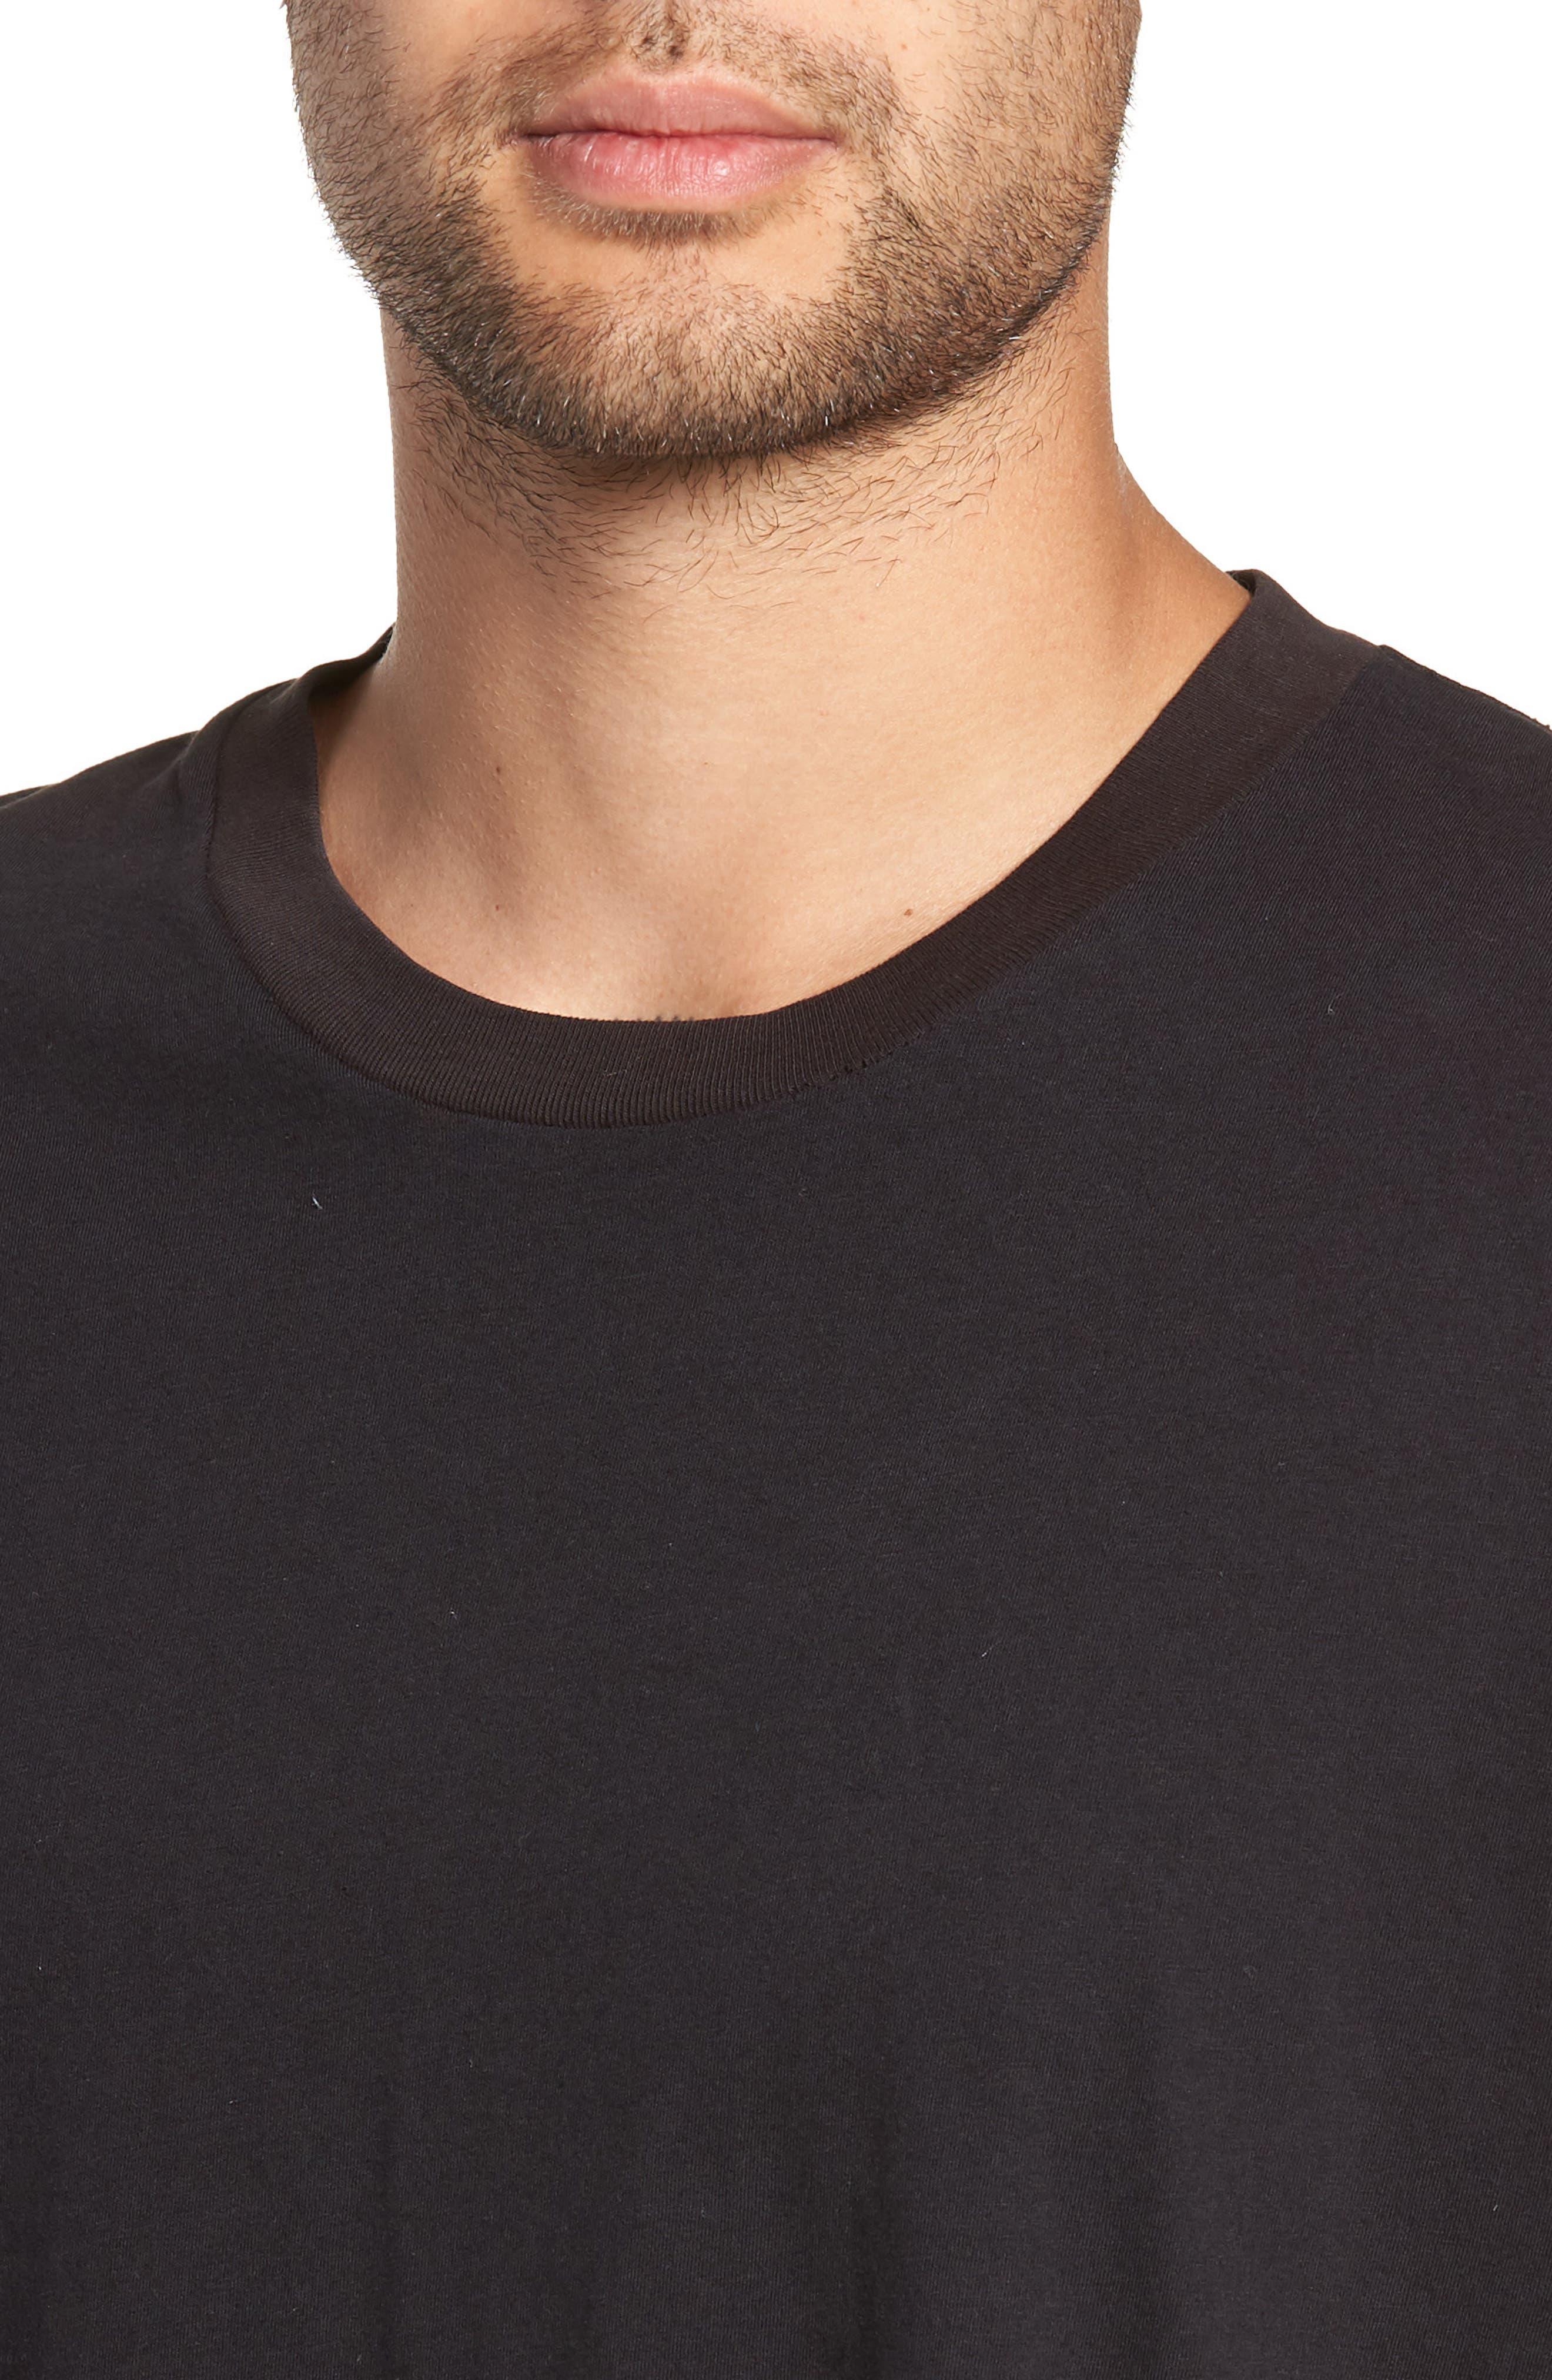 Same Old Madness Oversize T-Shirt,                             Alternate thumbnail 4, color,                             BLACK